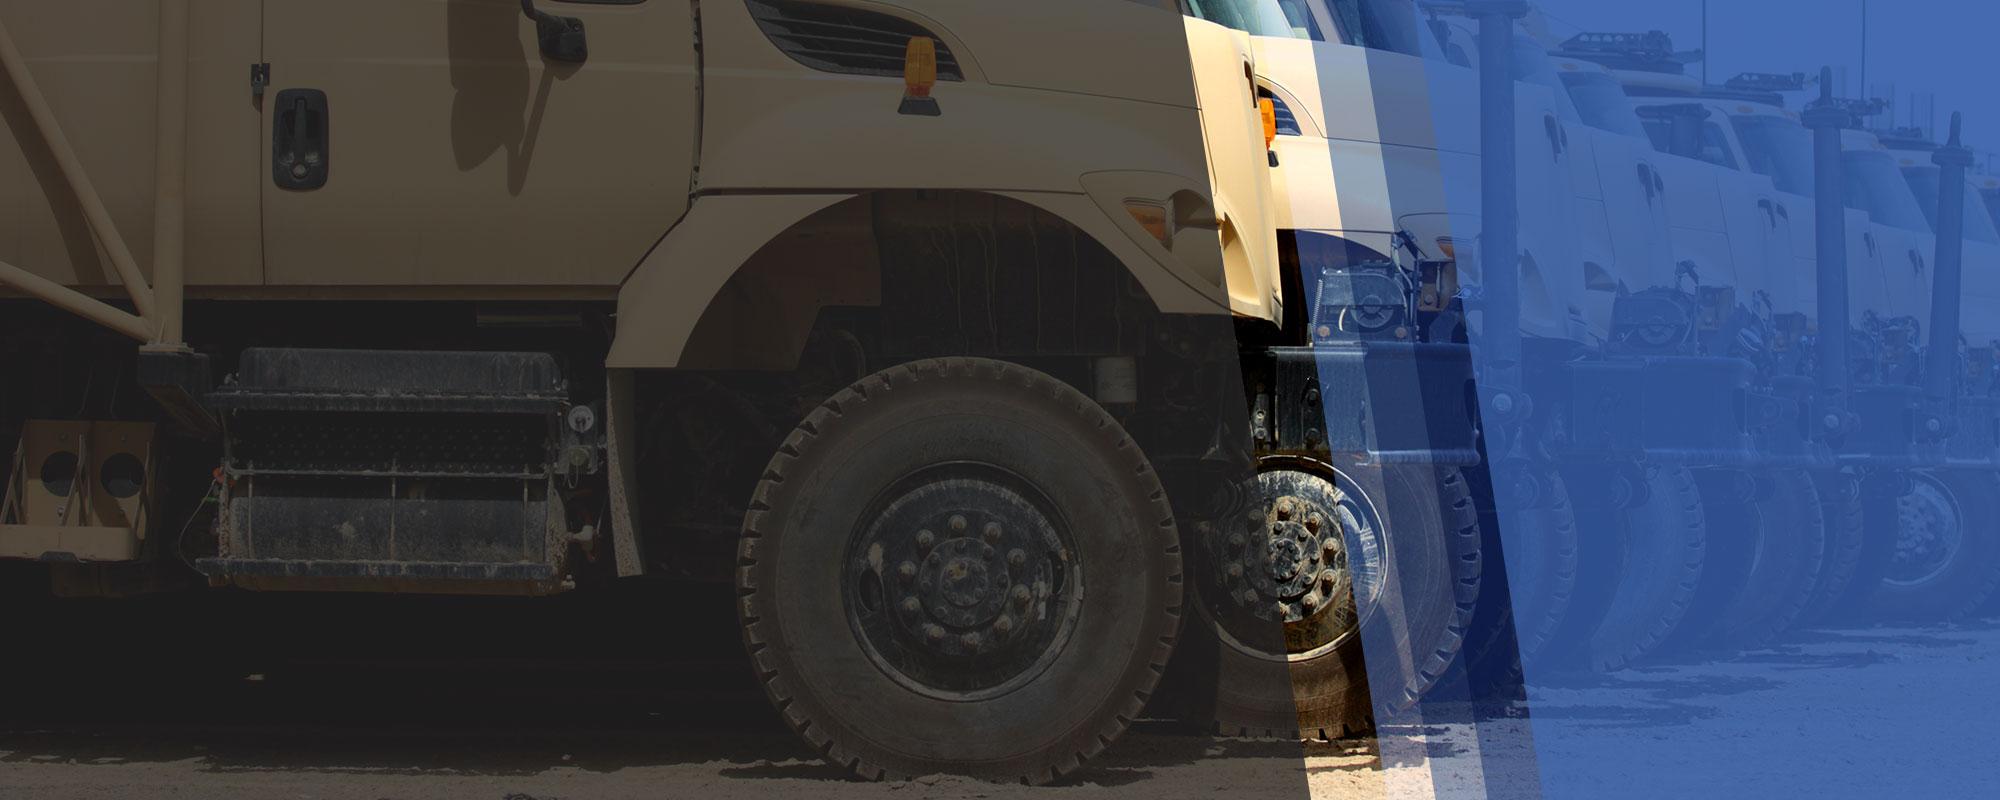 Industrial Coatings - How Polyurea Coatings Help Military Vehicles | IXS Coatings